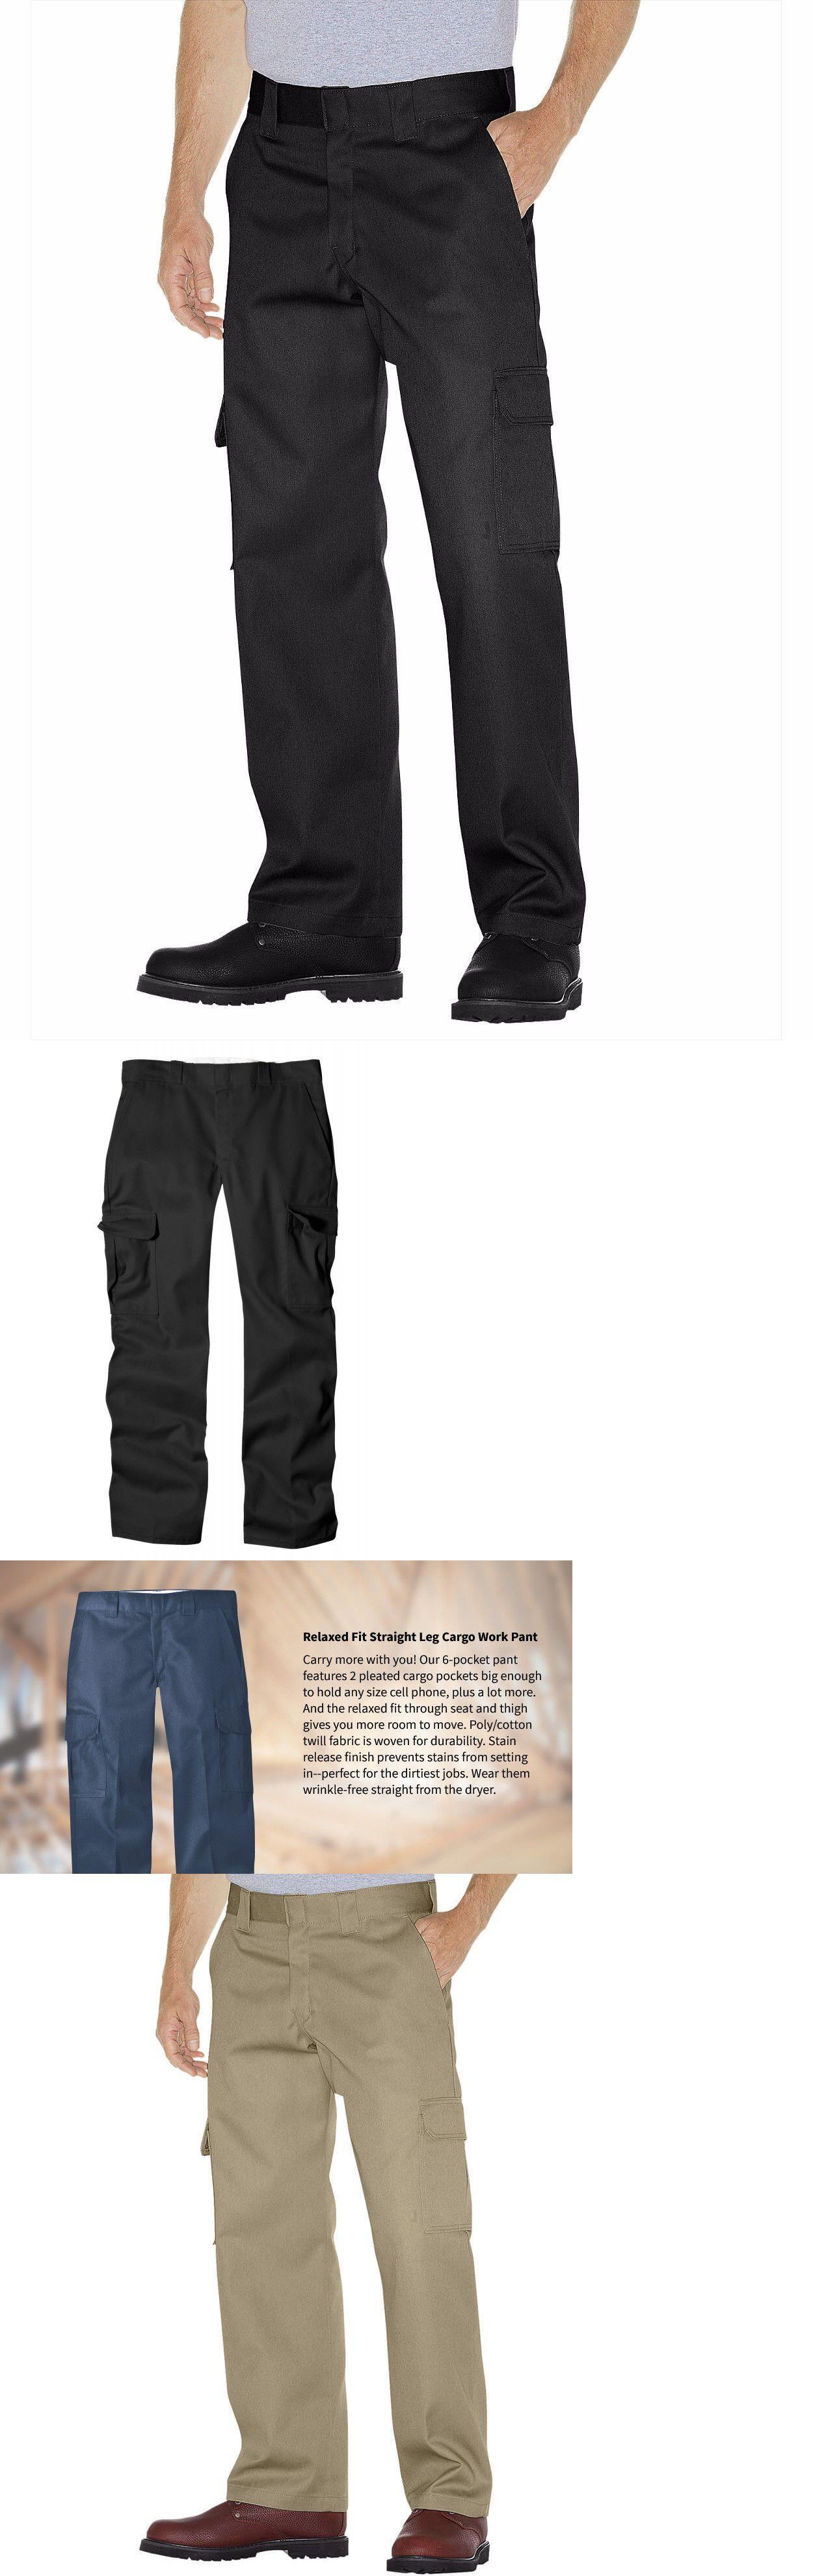 Military Tactical BDU Pants Propper Uniform Cargo Pant Black Cotton Twill F5250